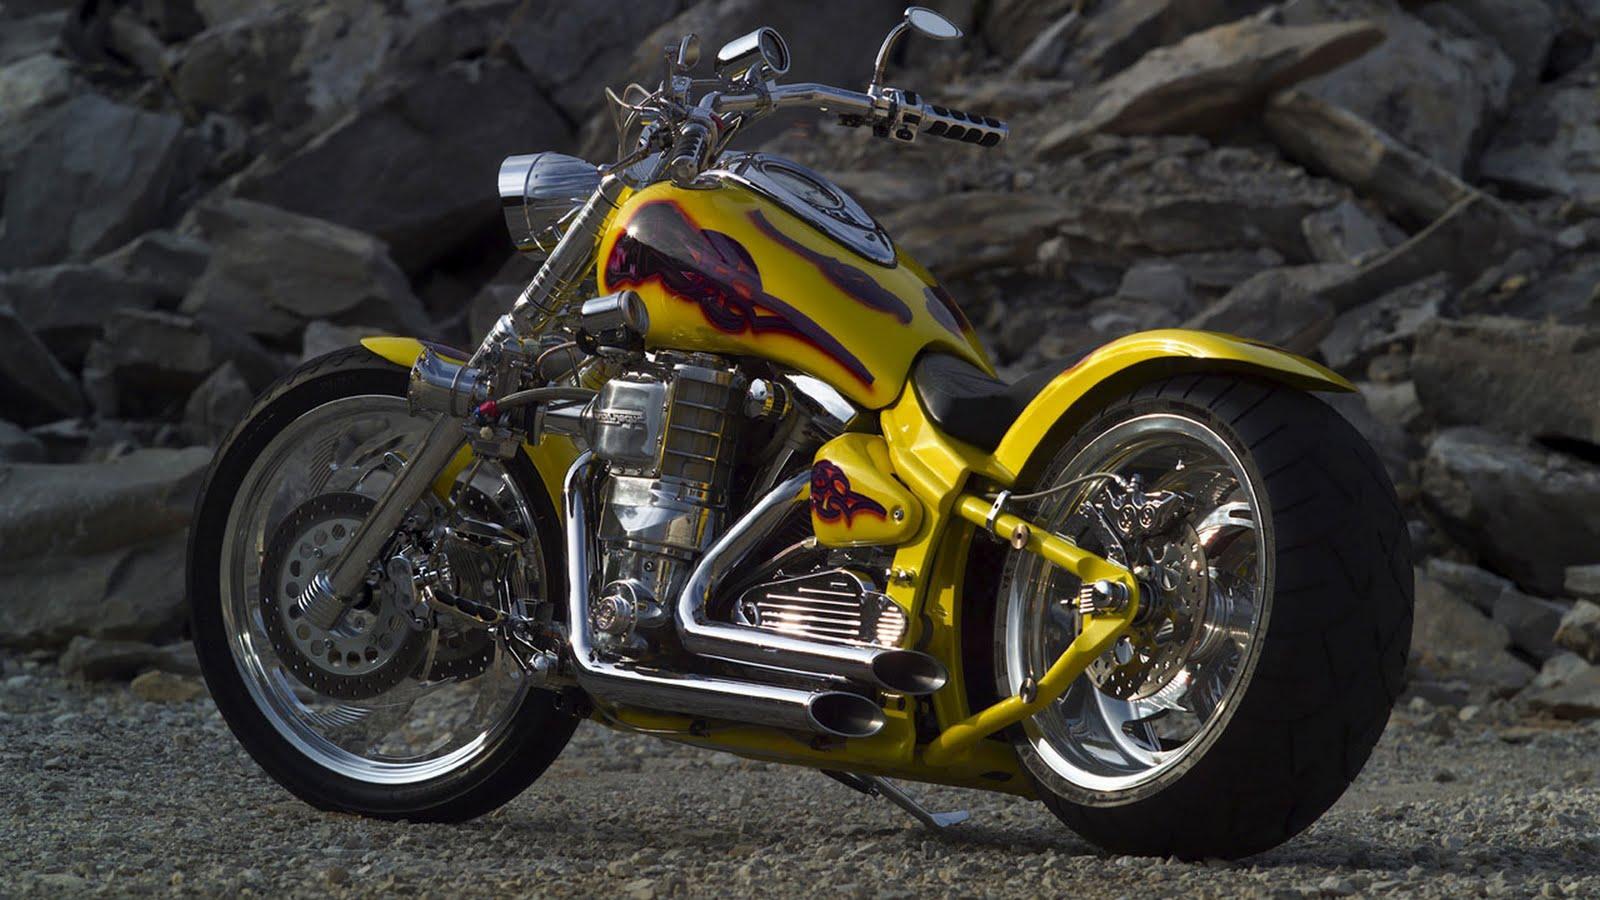 Best Top Desktop Motorcycles Wallpapers Hd Beautiful Motorcycle 1600x900